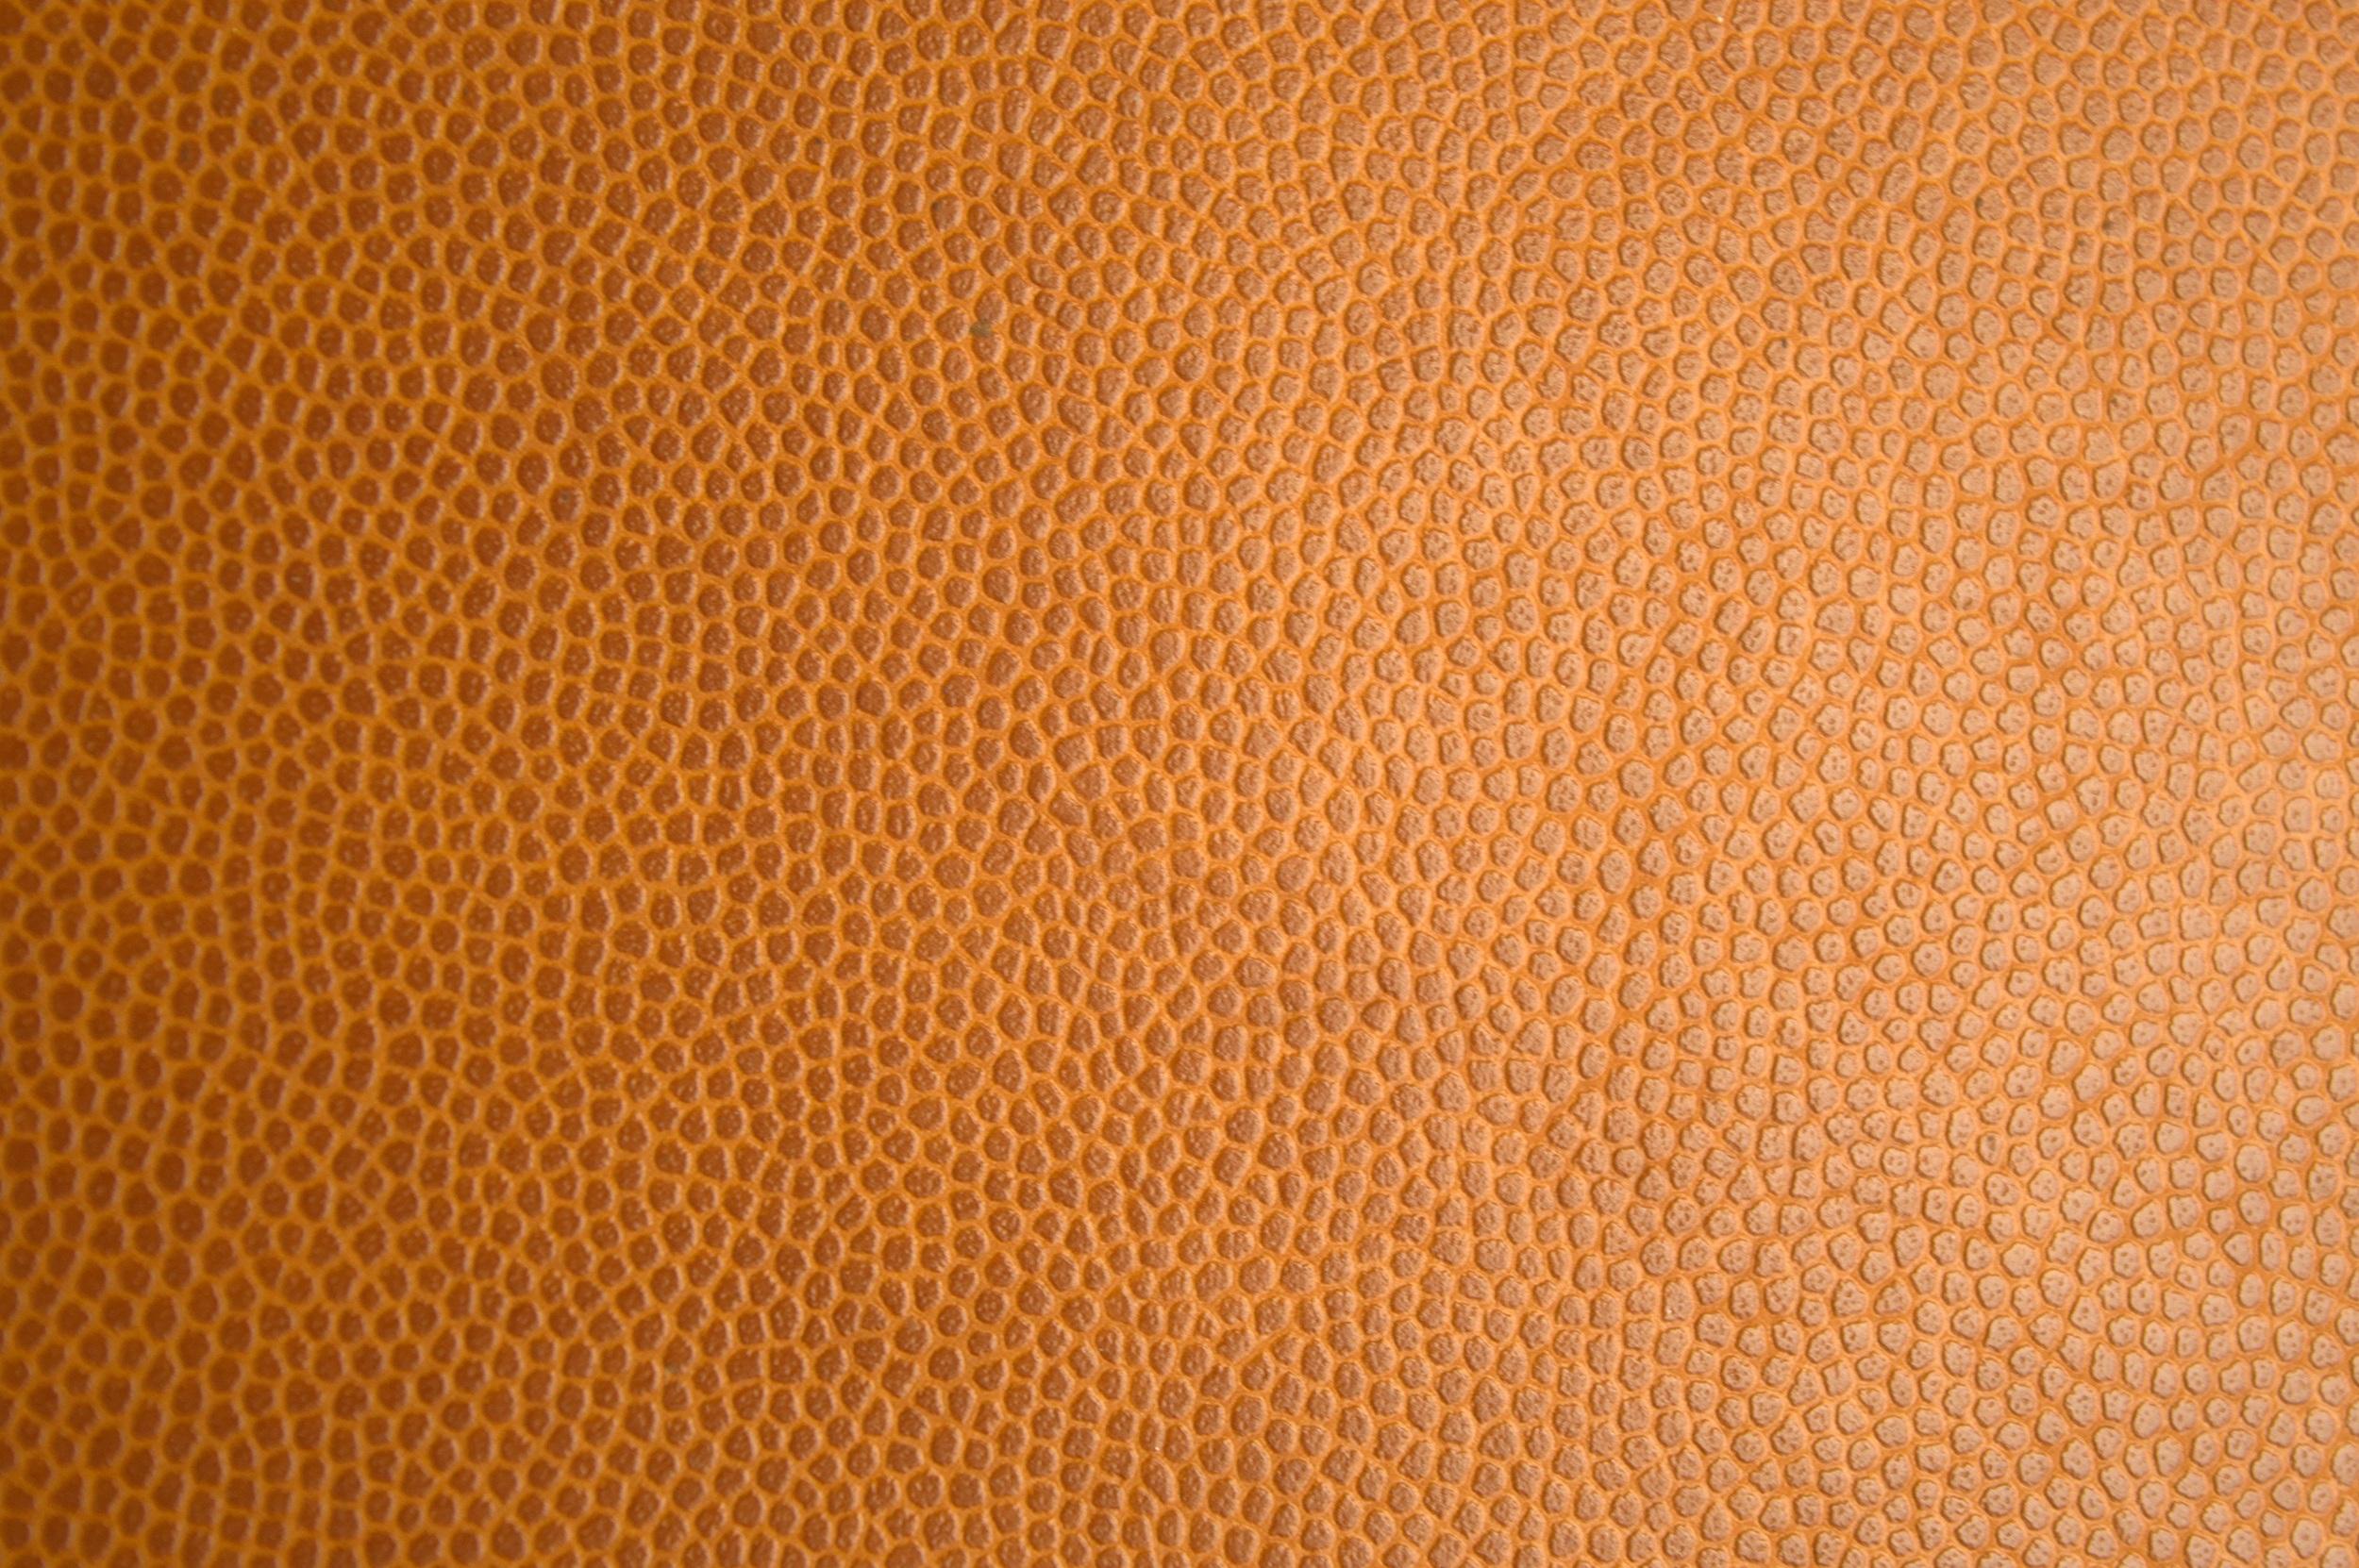 fotos gratis textura piso patr n l nea amarillo material circulo superficie. Black Bedroom Furniture Sets. Home Design Ideas